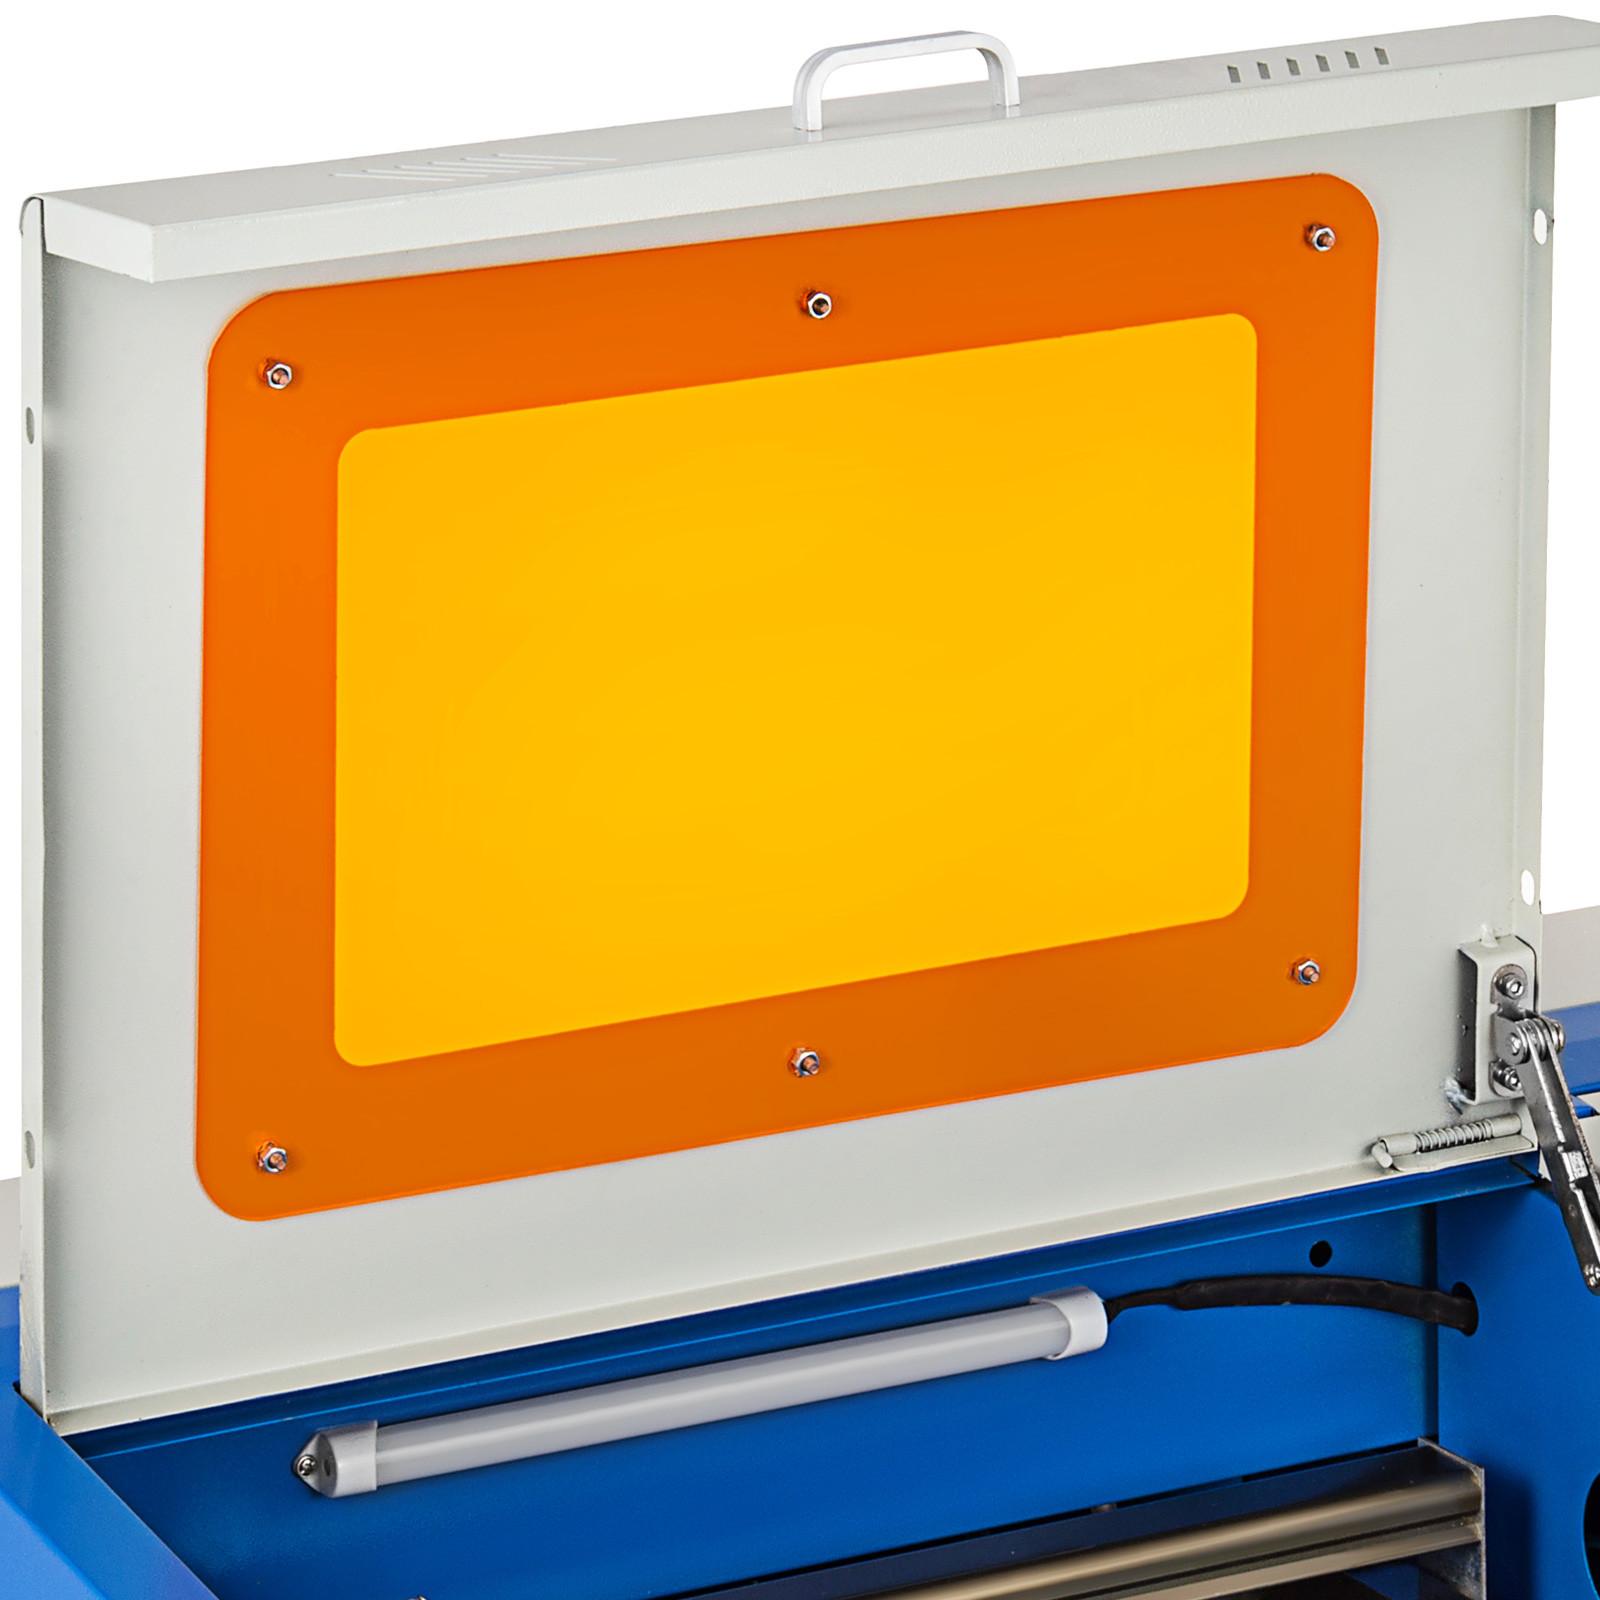 Macchina-per-Incisione-Laser-CO2-40-130W-Asse-Rotante-Tagliatrice-Incisore miniatura 104